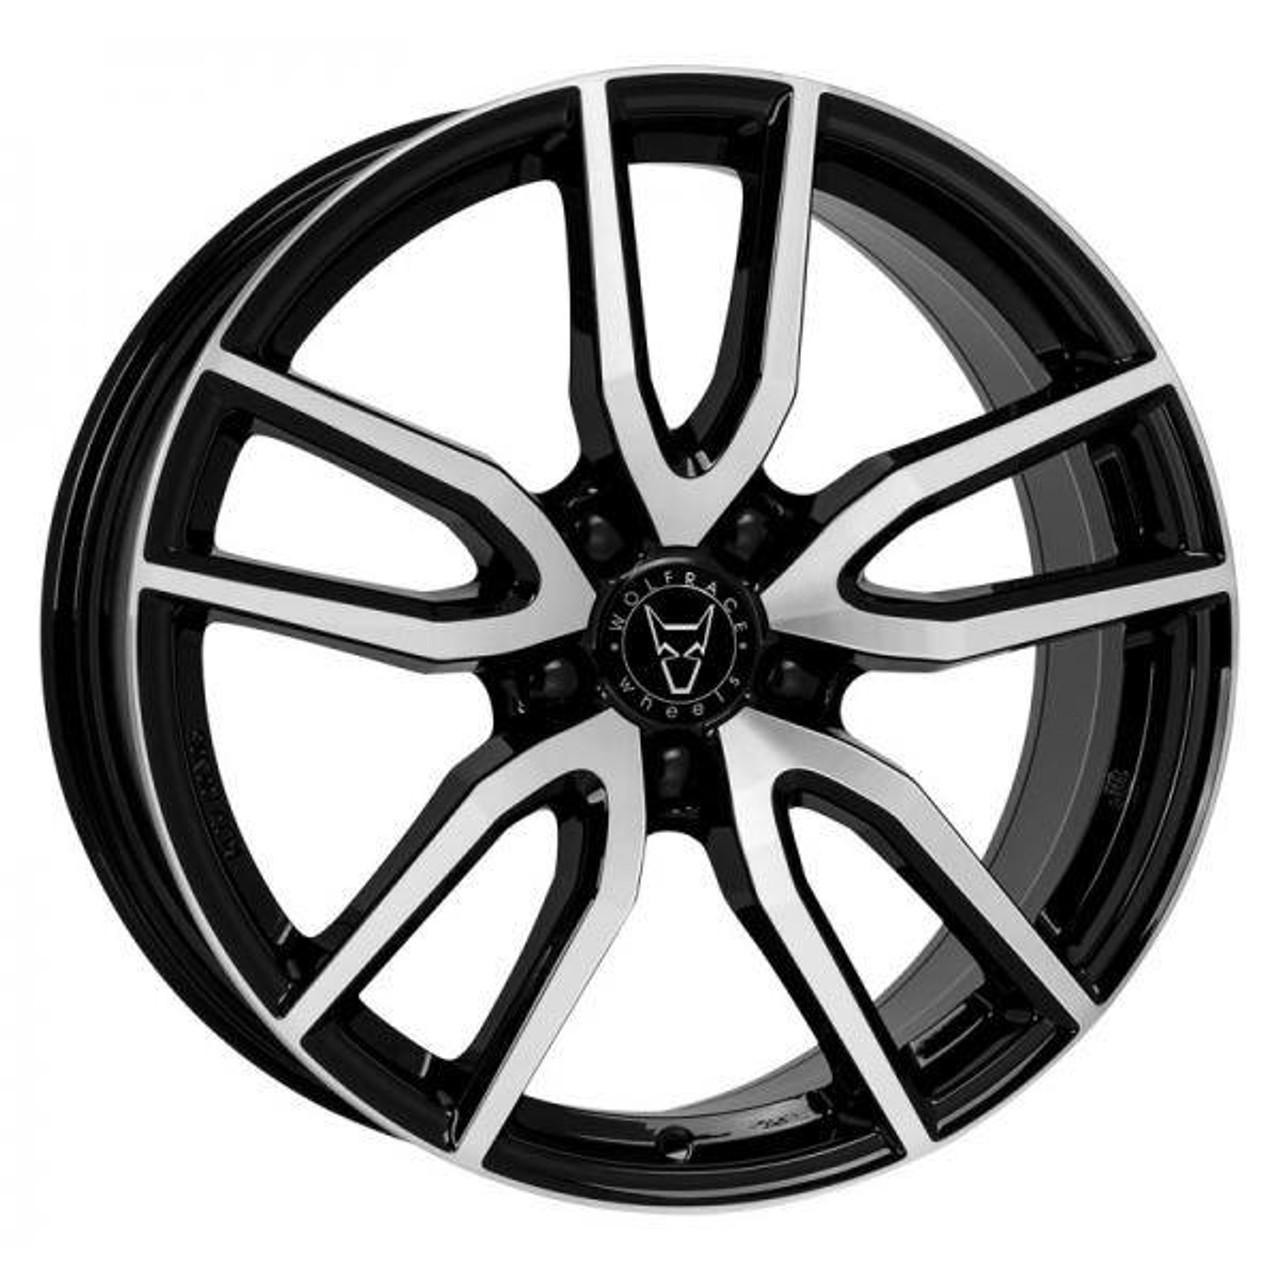 Wolfrace GB Torino Alloy Wheels Gloss Black / Polished